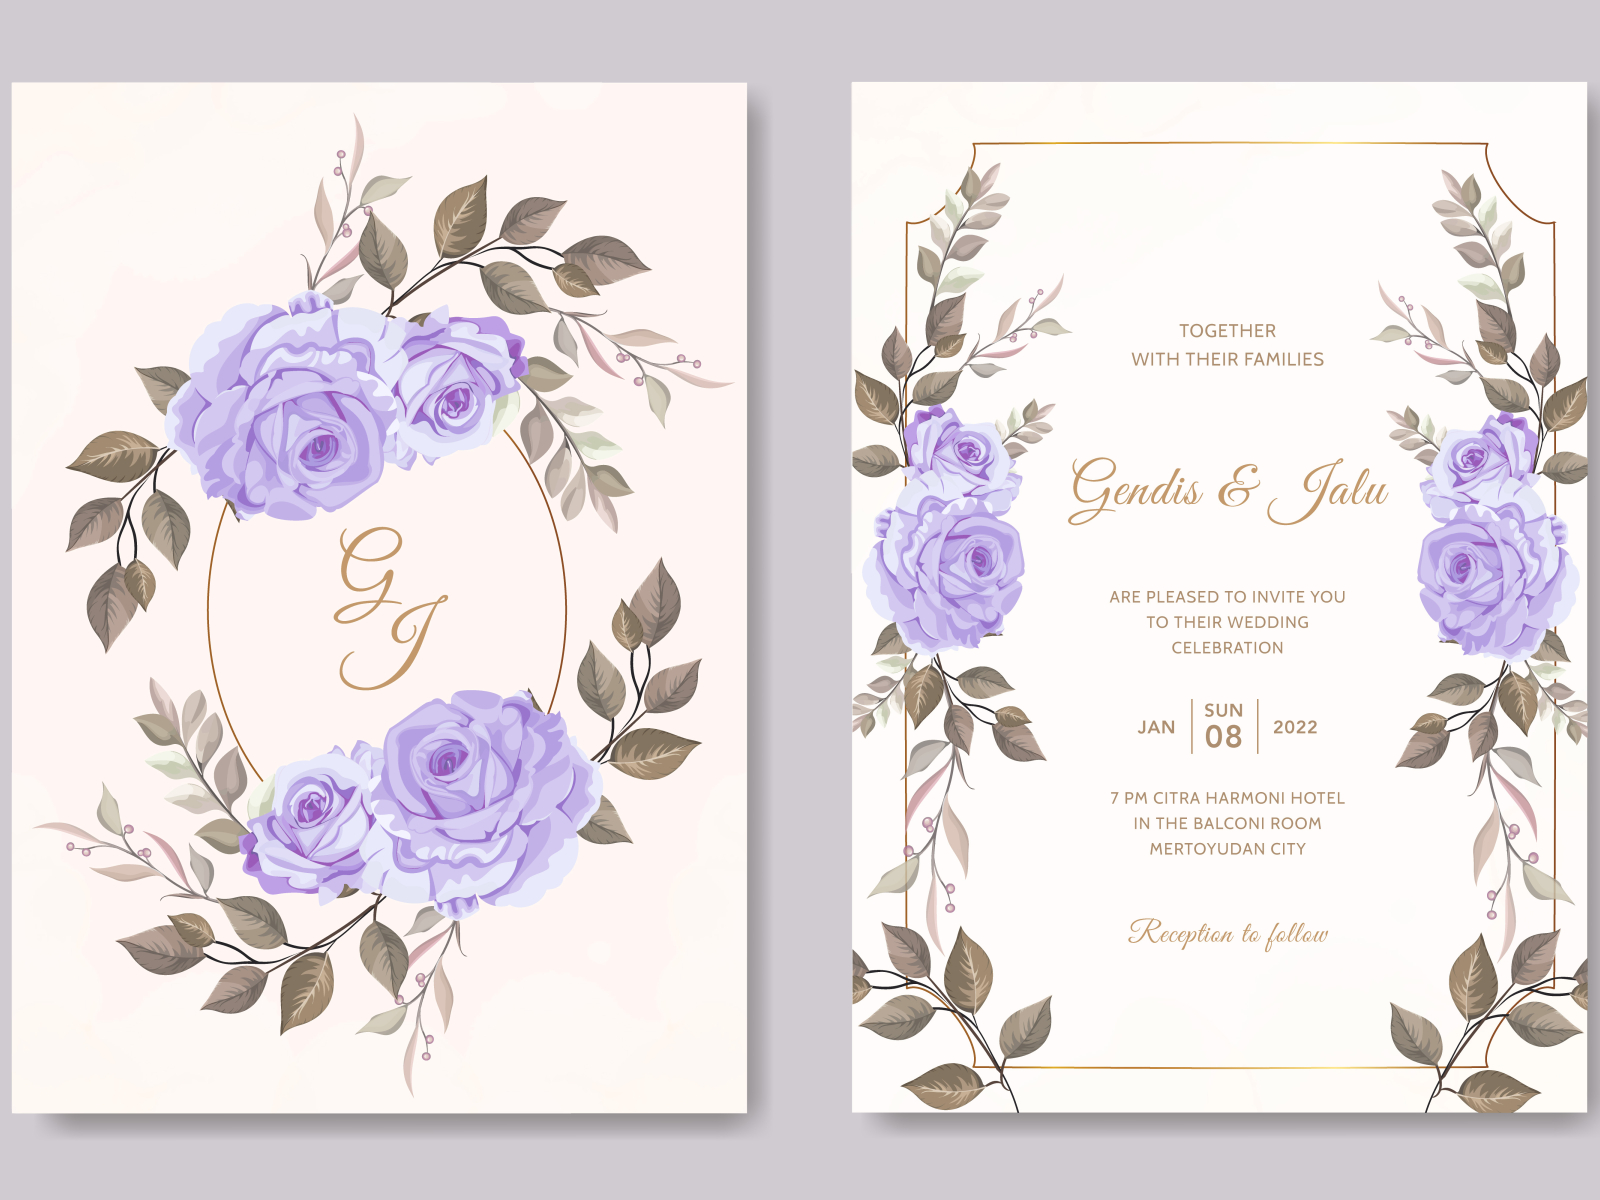 vintage wedding invitation card template purple rose flower by andrias  robin hutama on Dribbble